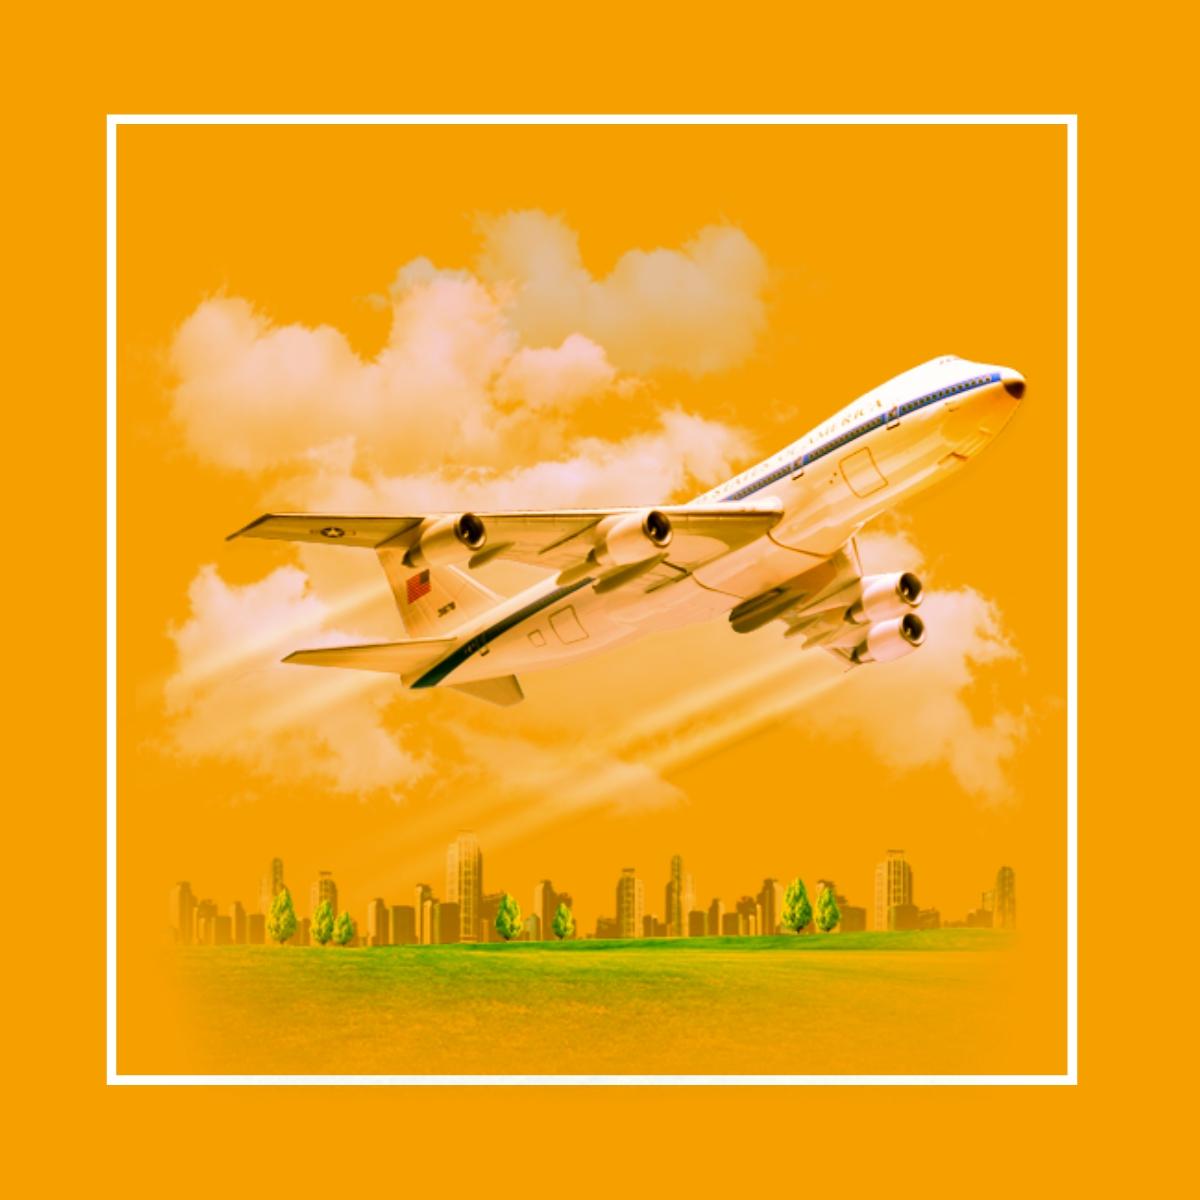 Boletos Aéreos